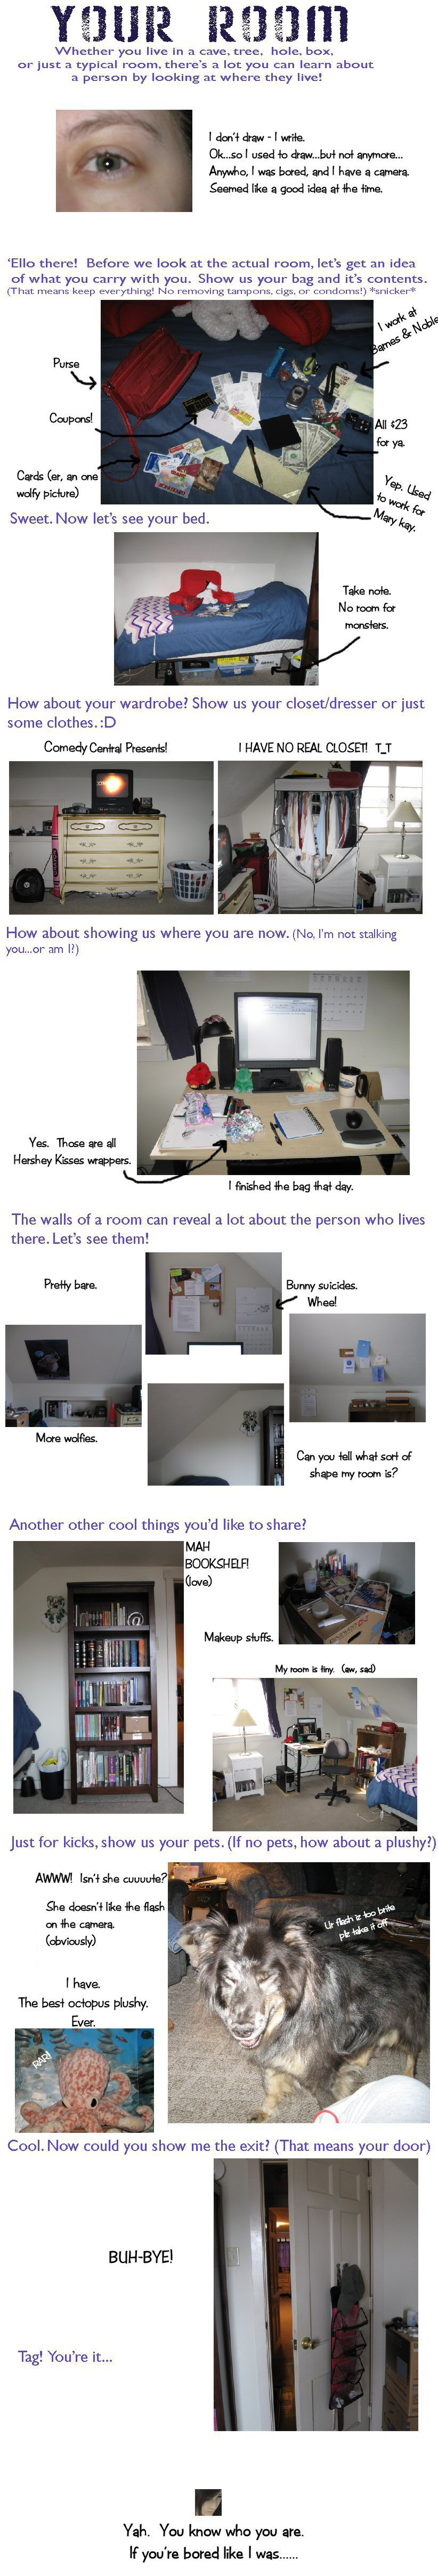 Room Meme by AlterEgox5